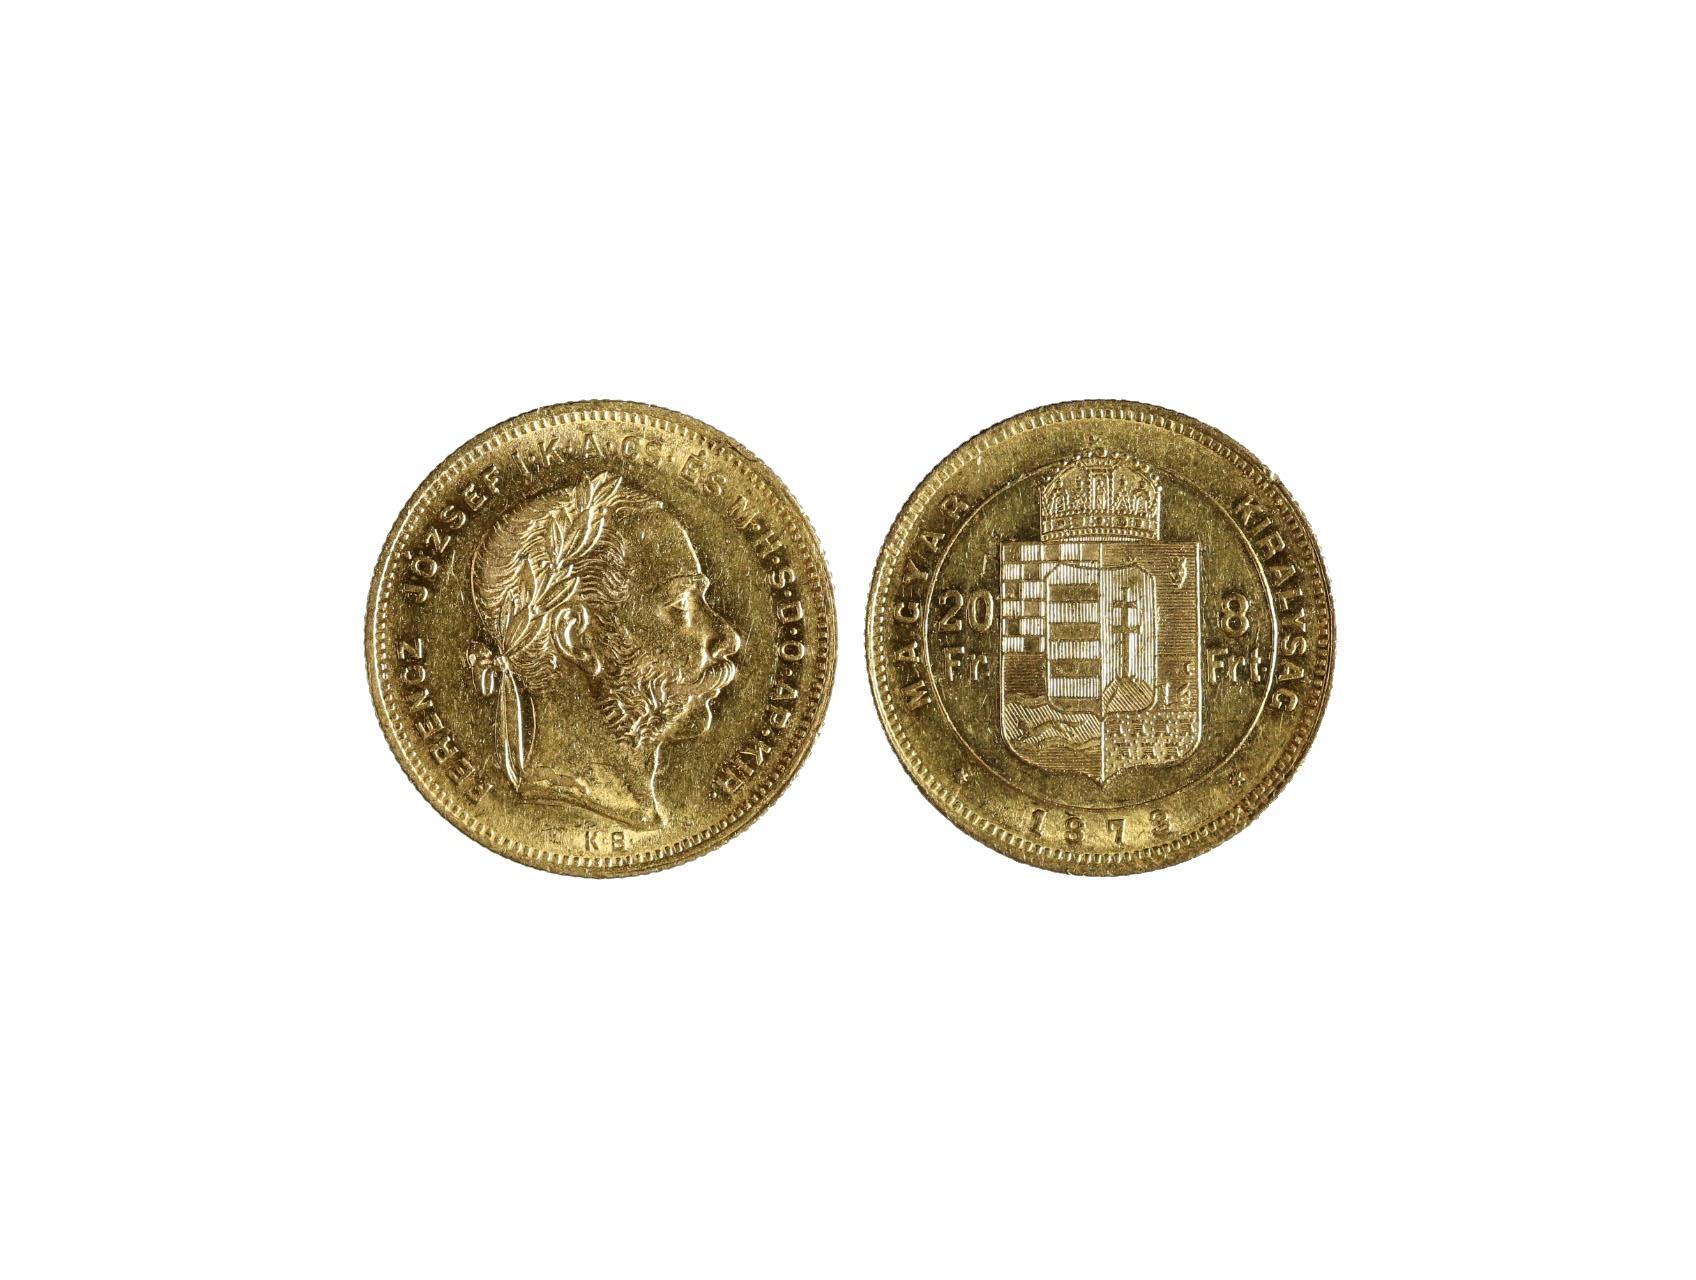 František Josef I. 1848-1916 - 8 Zlatník 1873 K.B., N127